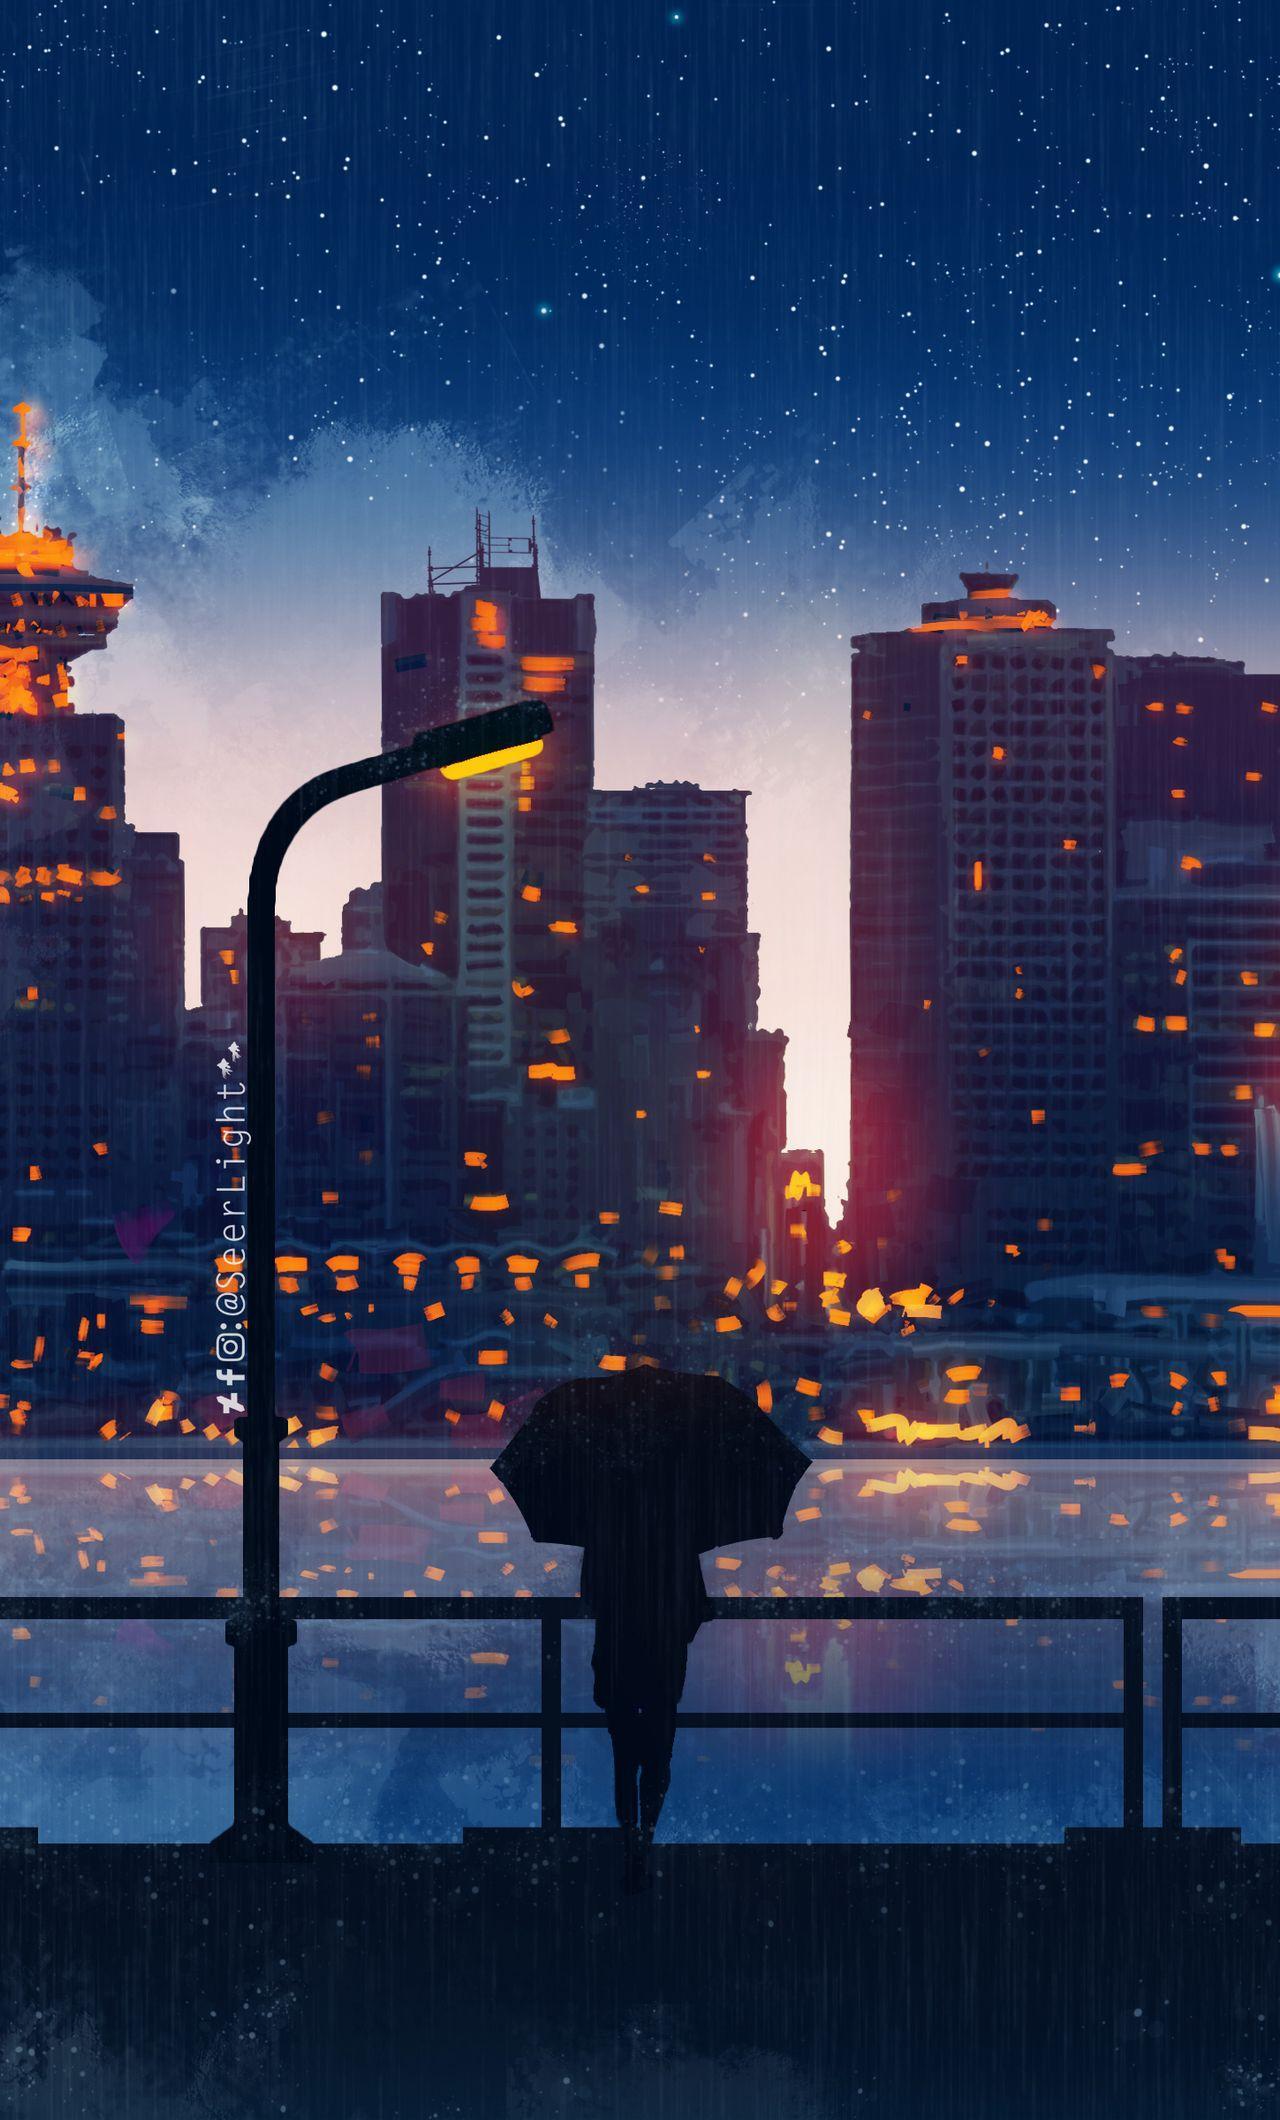 Anime Night City Wallpapers - Top Free Anime Night City ...